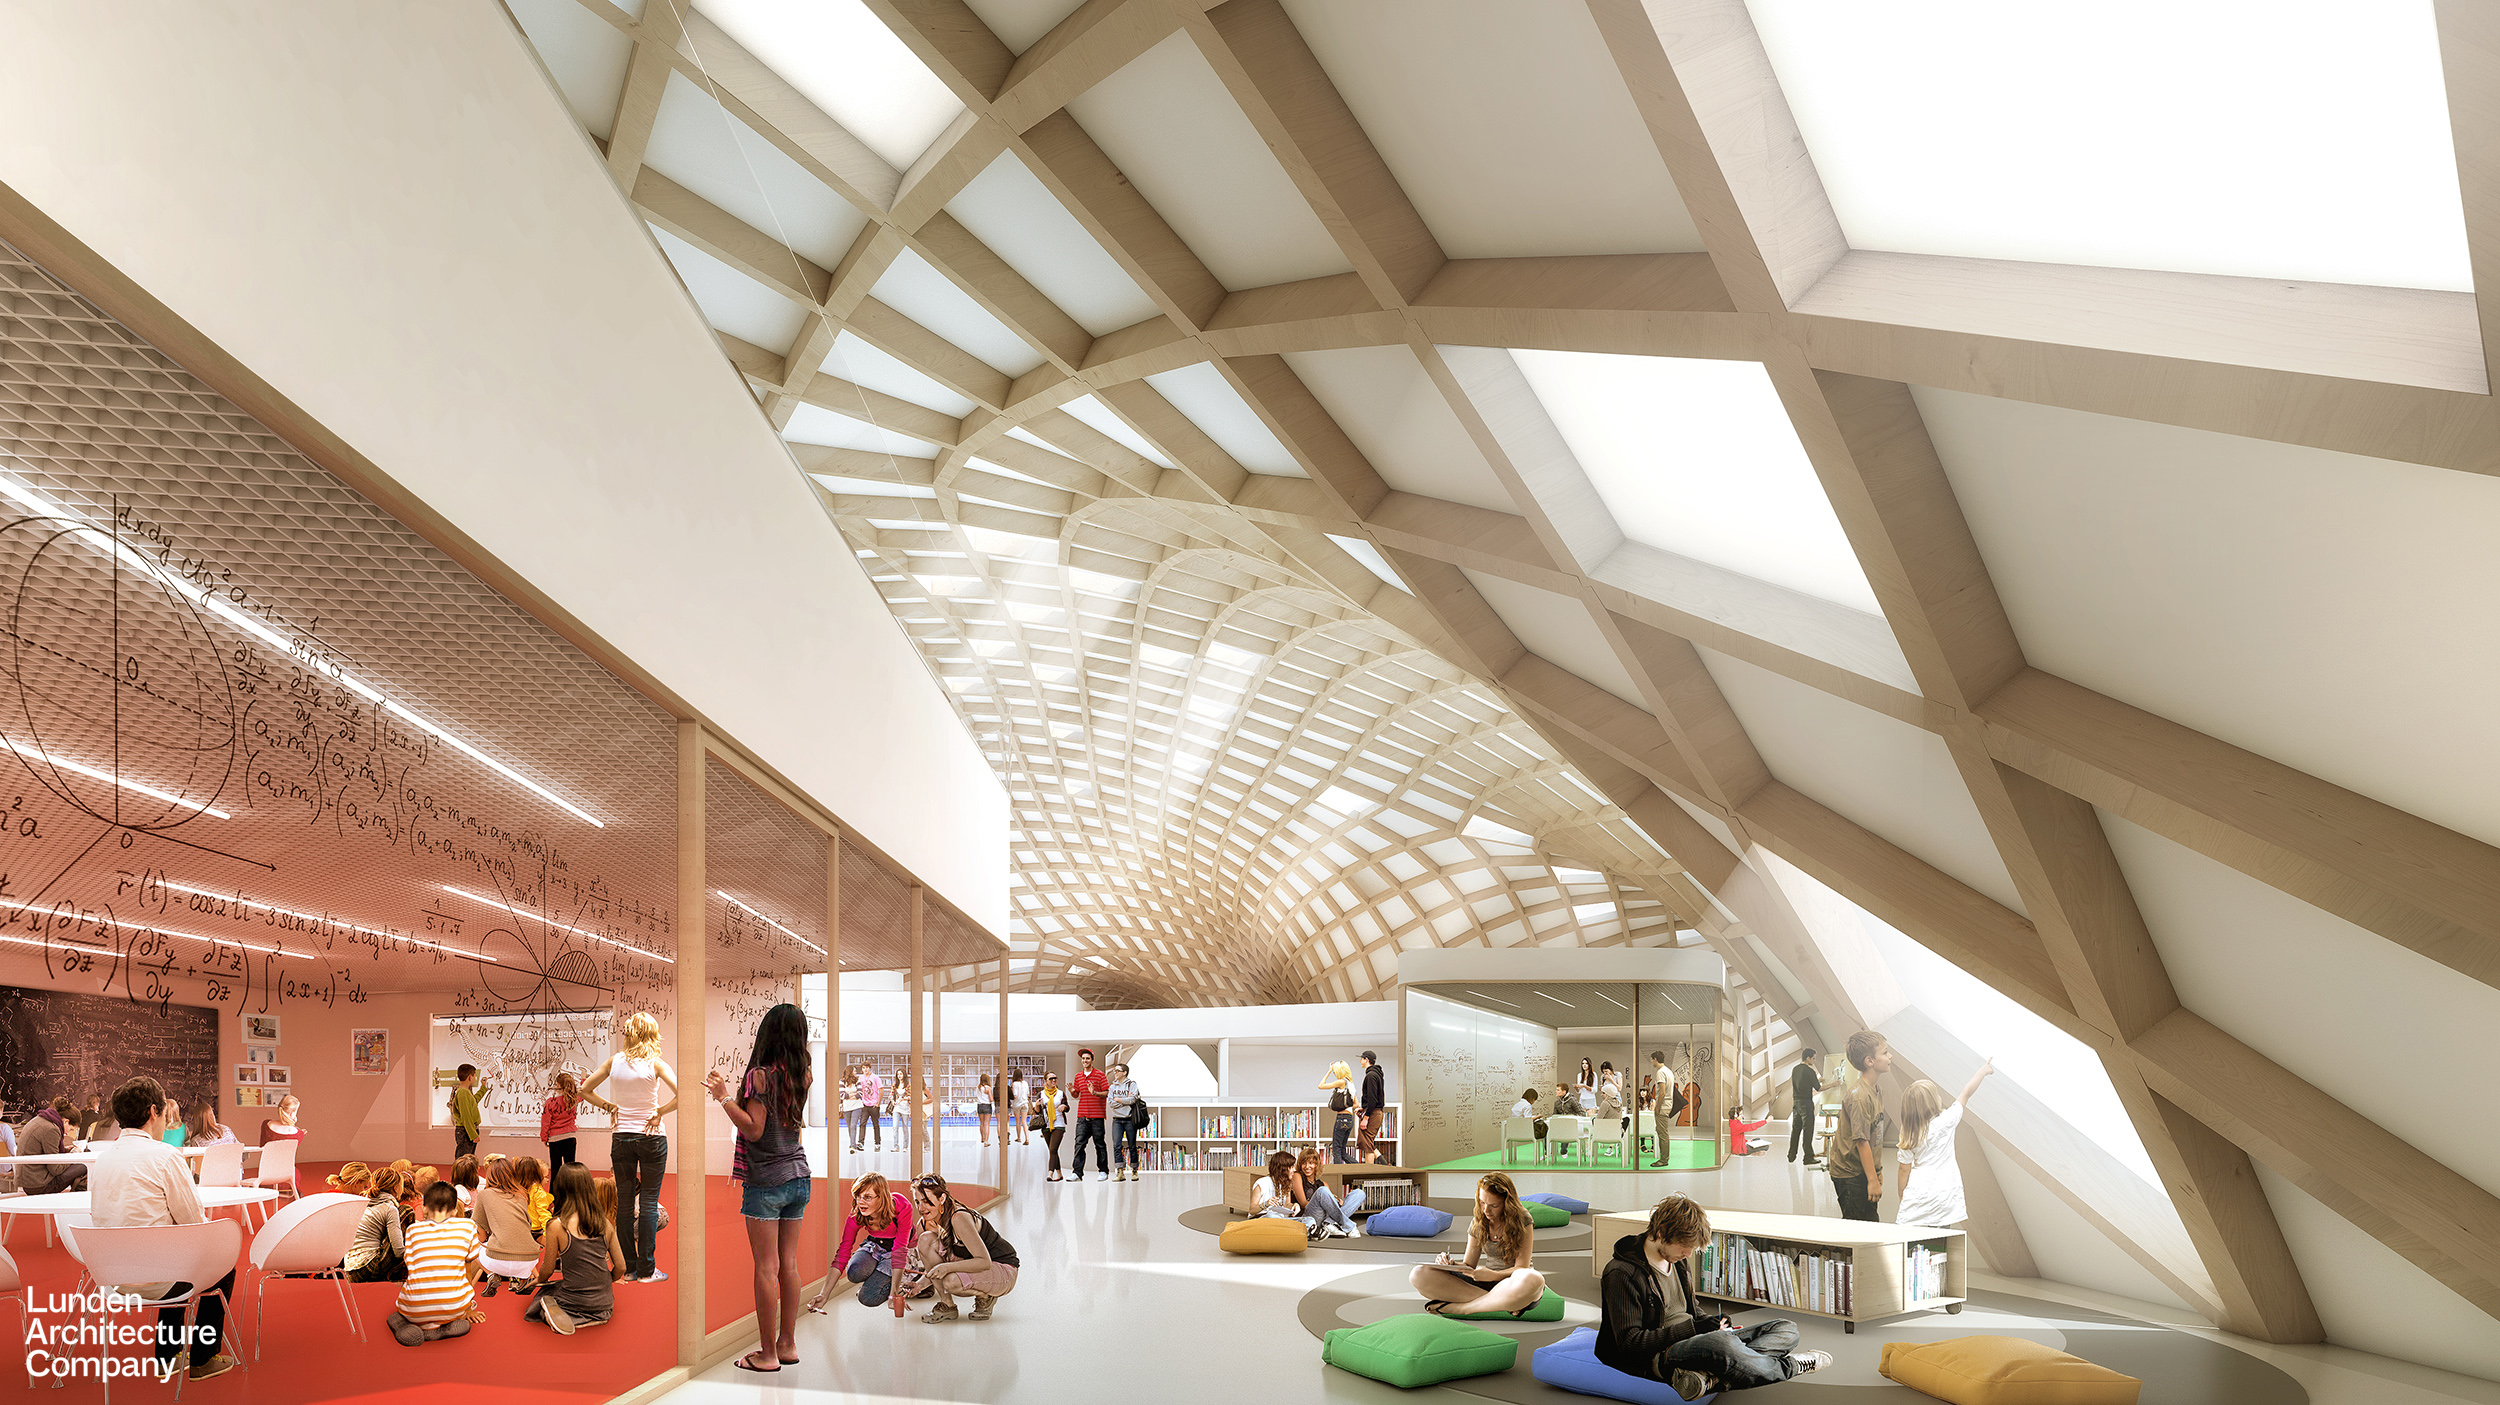 Lunden Architecture Company_uusi koulu-ulko.jpeg